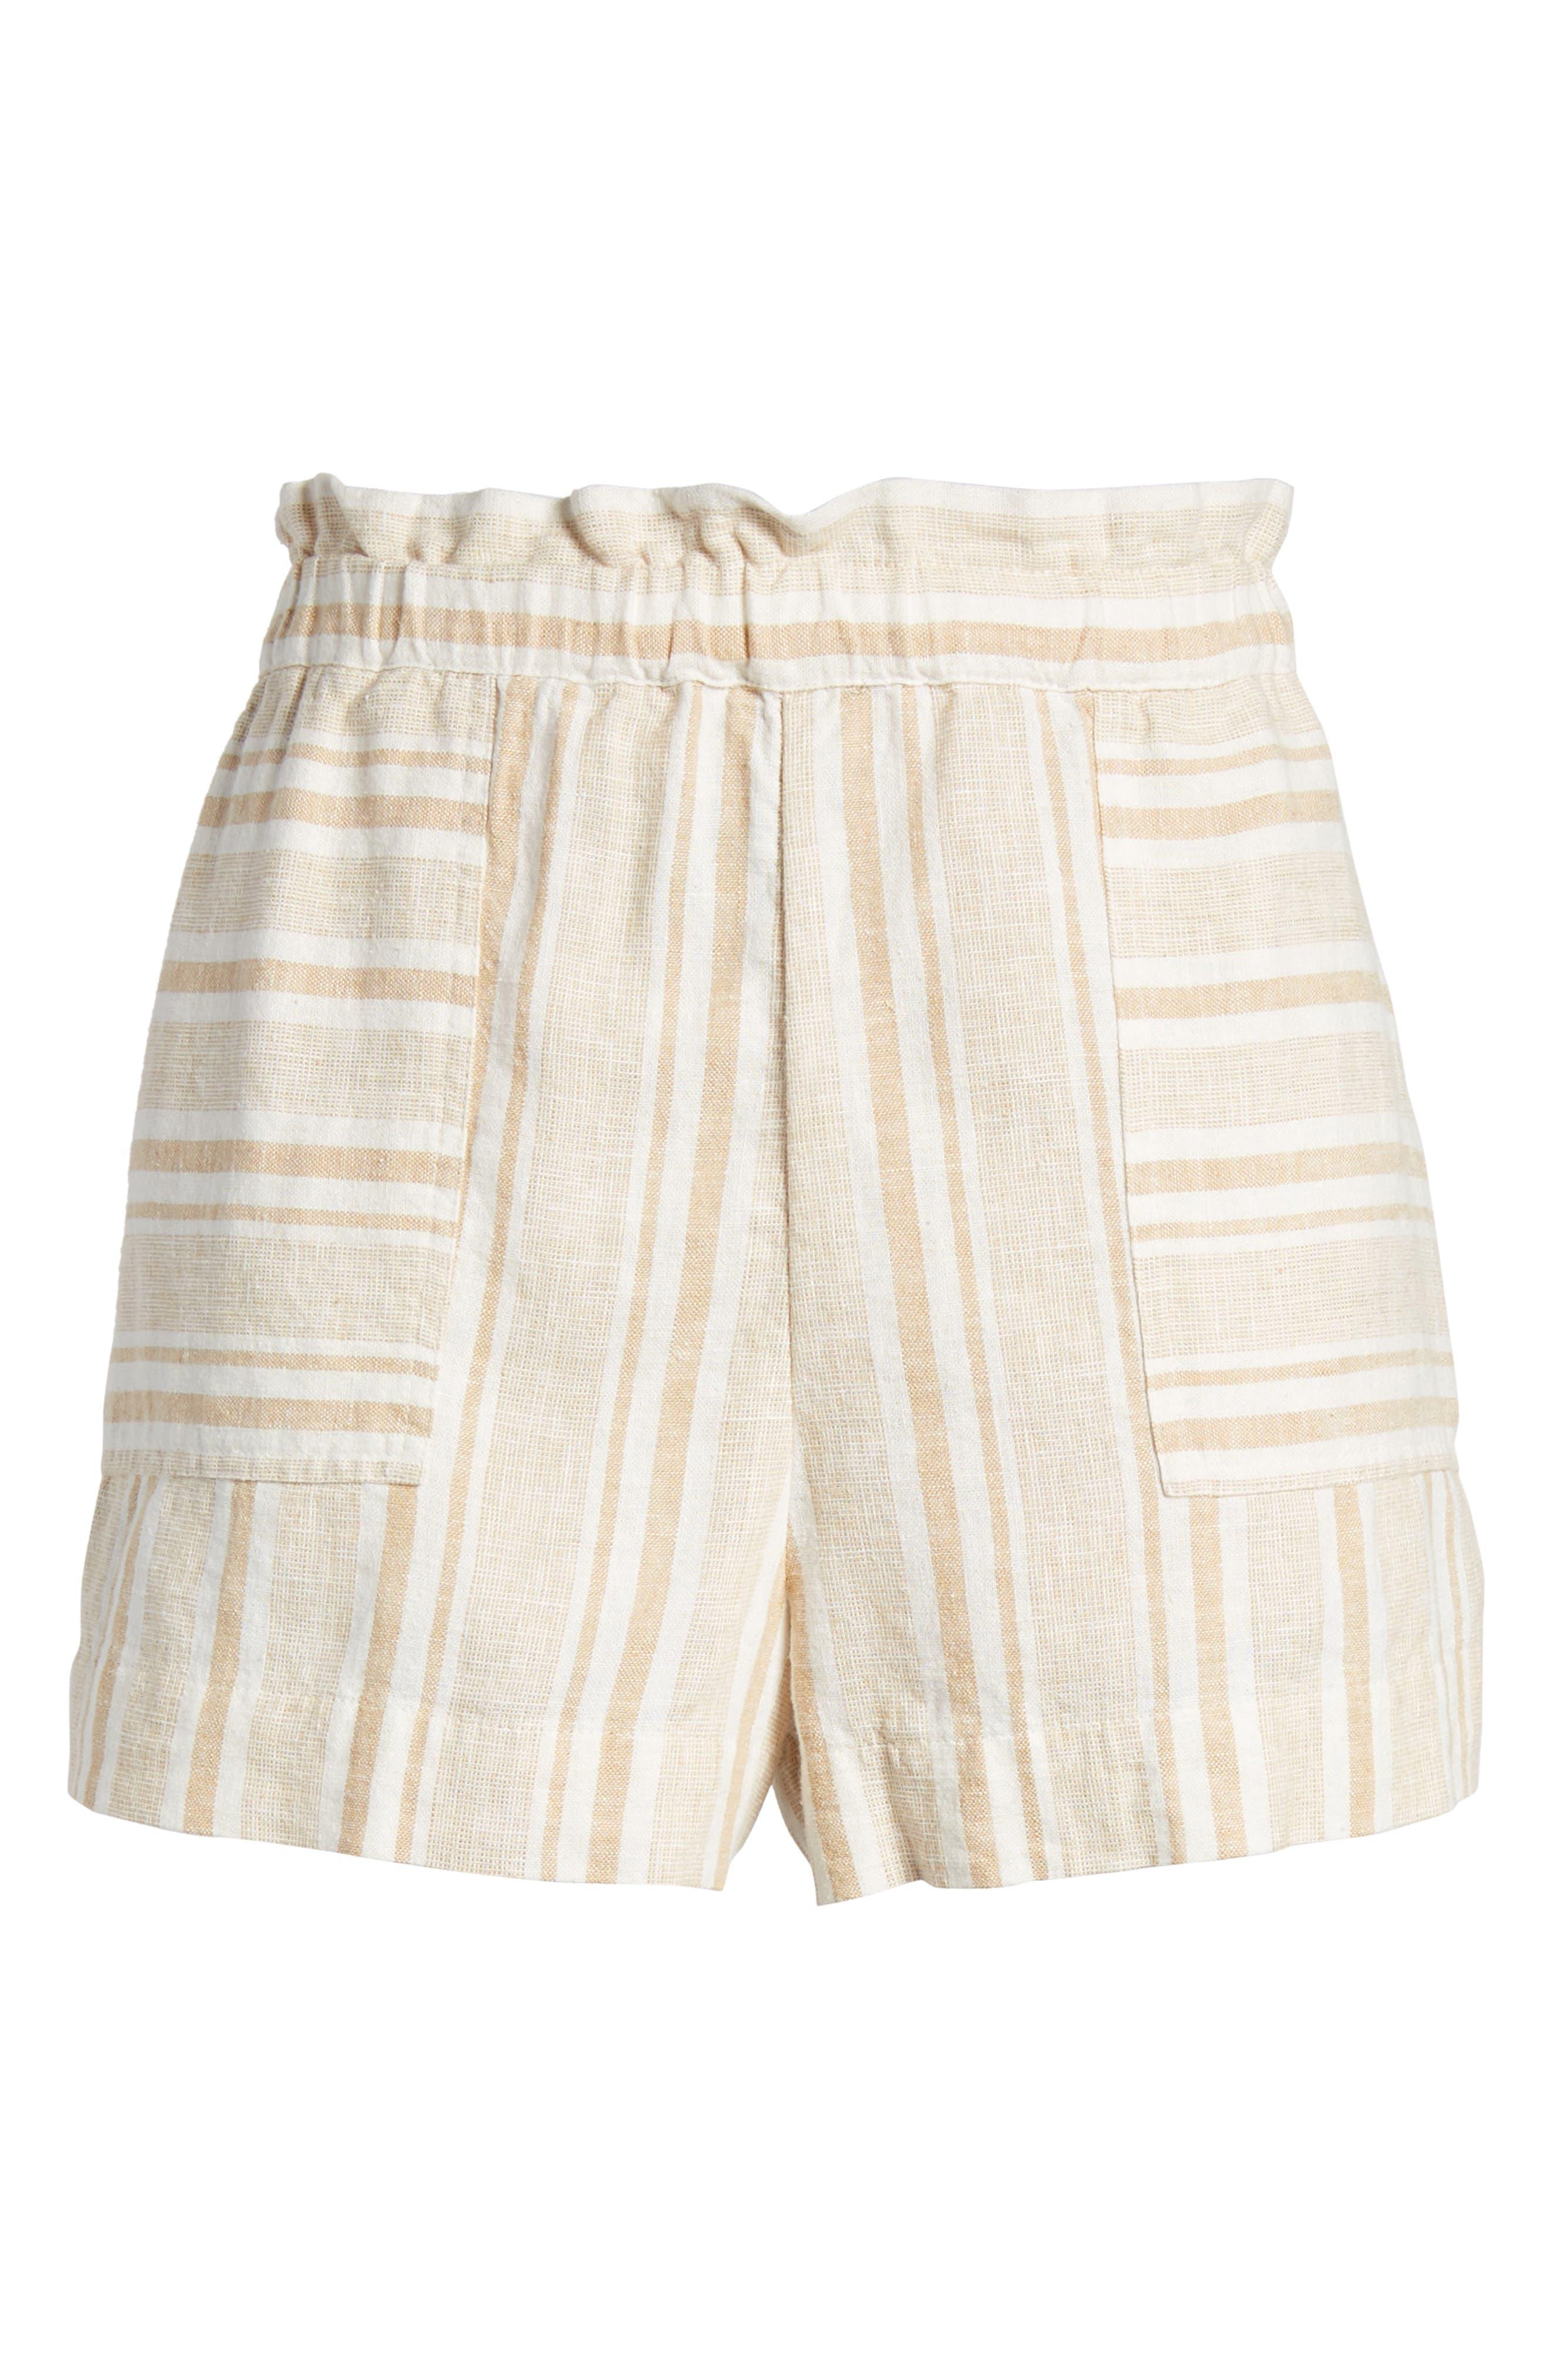 Stripe Linen Blend Shorts,                             Alternate thumbnail 6, color,                             Tan Lark Viola Stripe